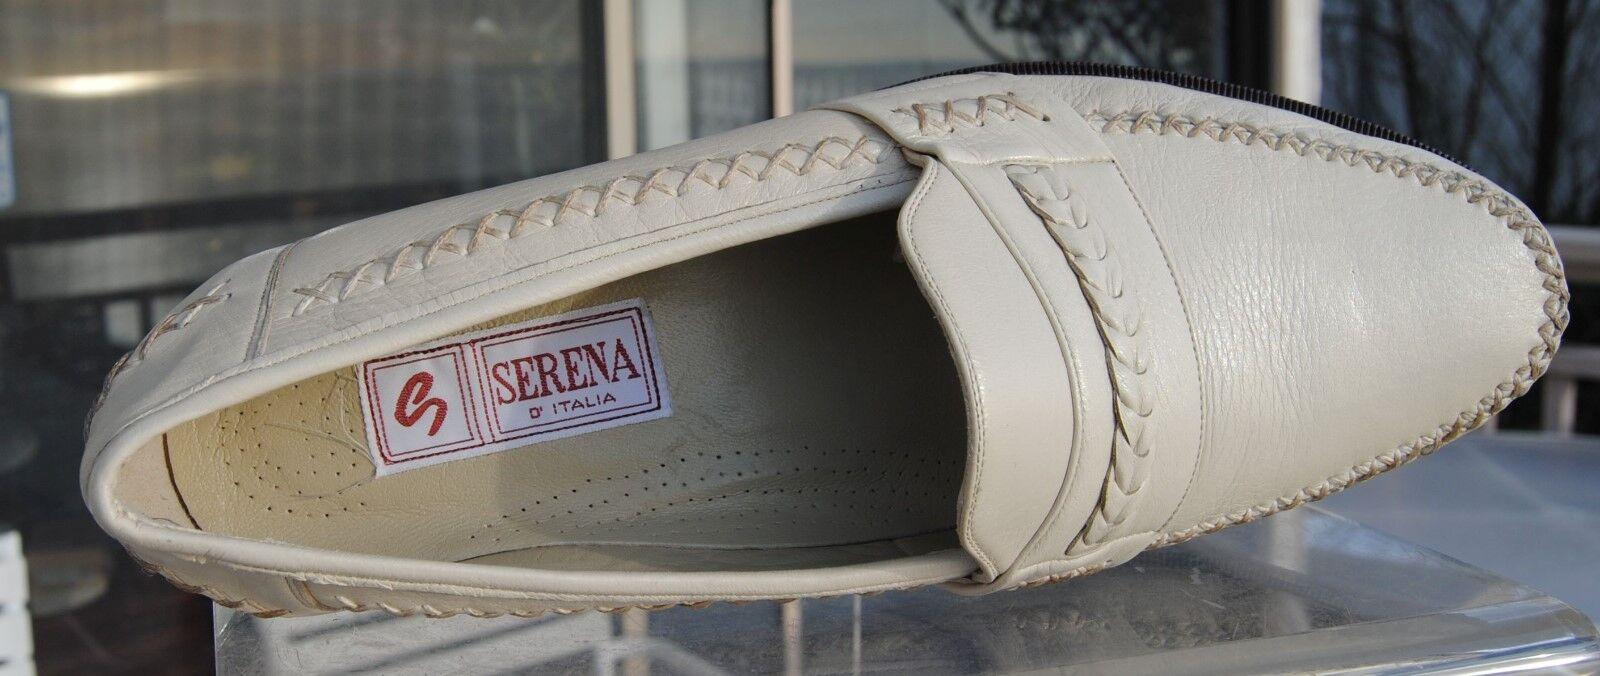 Serena D'Italia-Uomo ITALIAN White/Ivory  Deer Skin Slip On -Size -Size -Size 11.5 9ebb8c